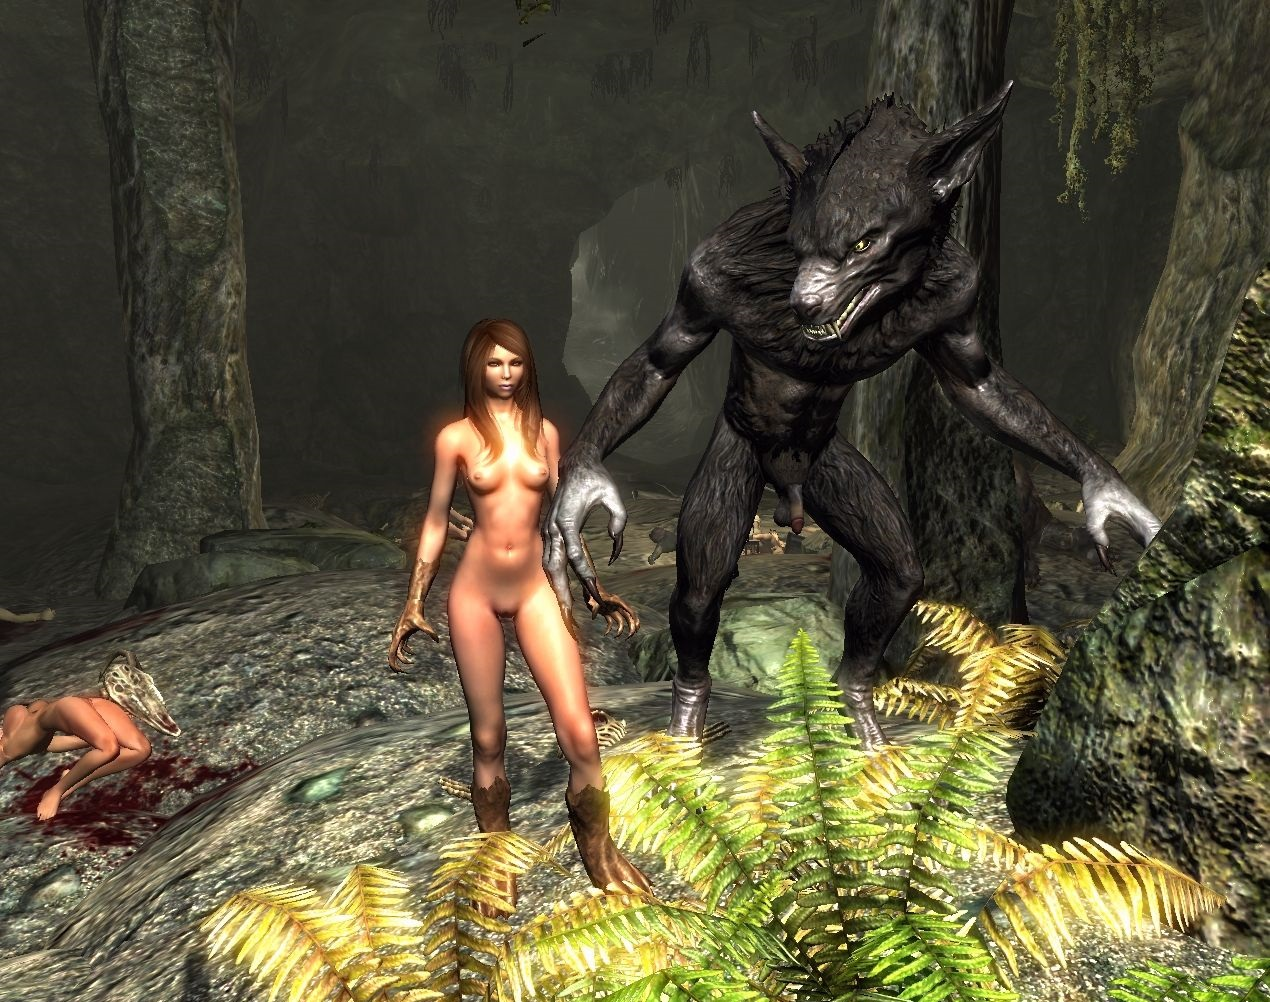 Порно мод секс со всеми скайрим видео